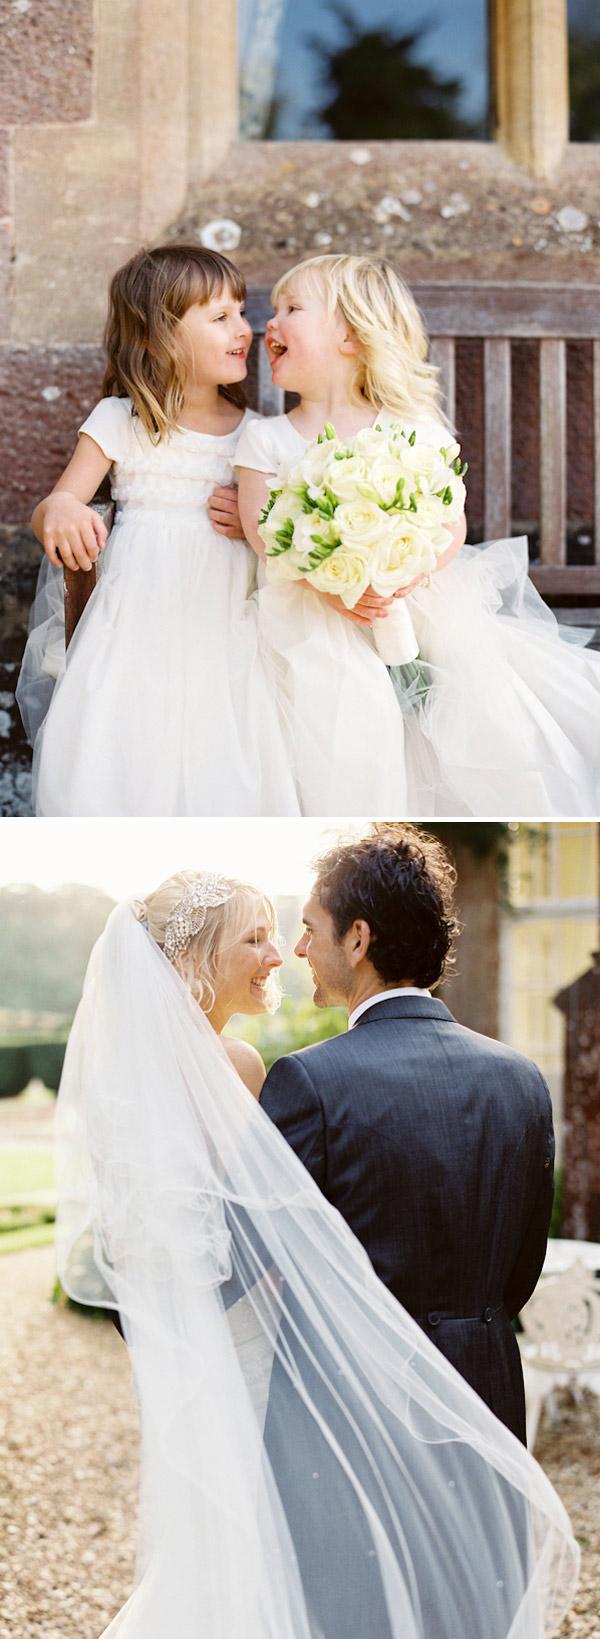 Jenny Packham at Harrods Archives - ROCK MY WEDDING | UK WEDDING ...